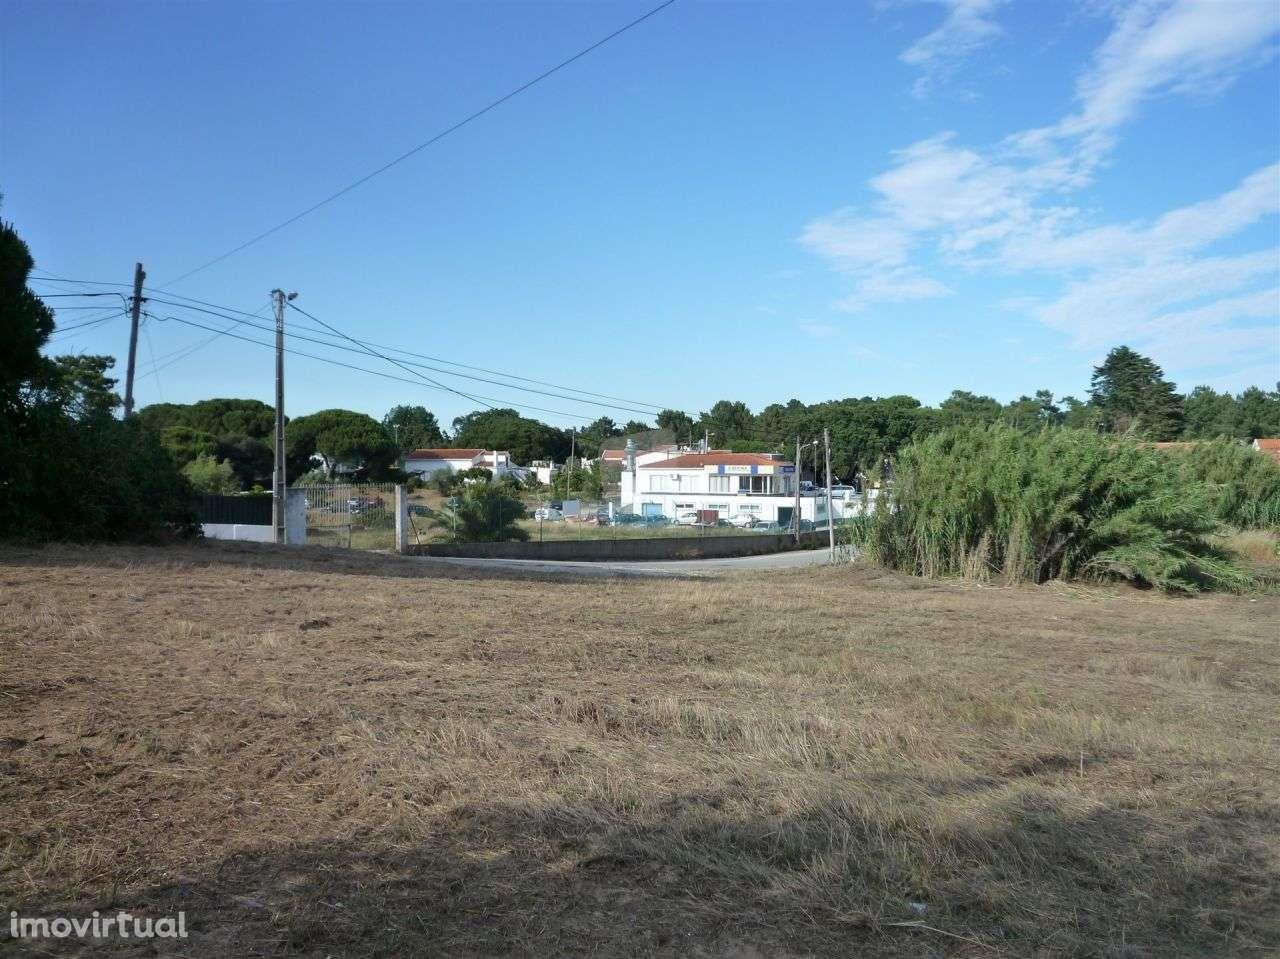 Terreno para comprar, Castelo (Sesimbra), Setúbal - Foto 11